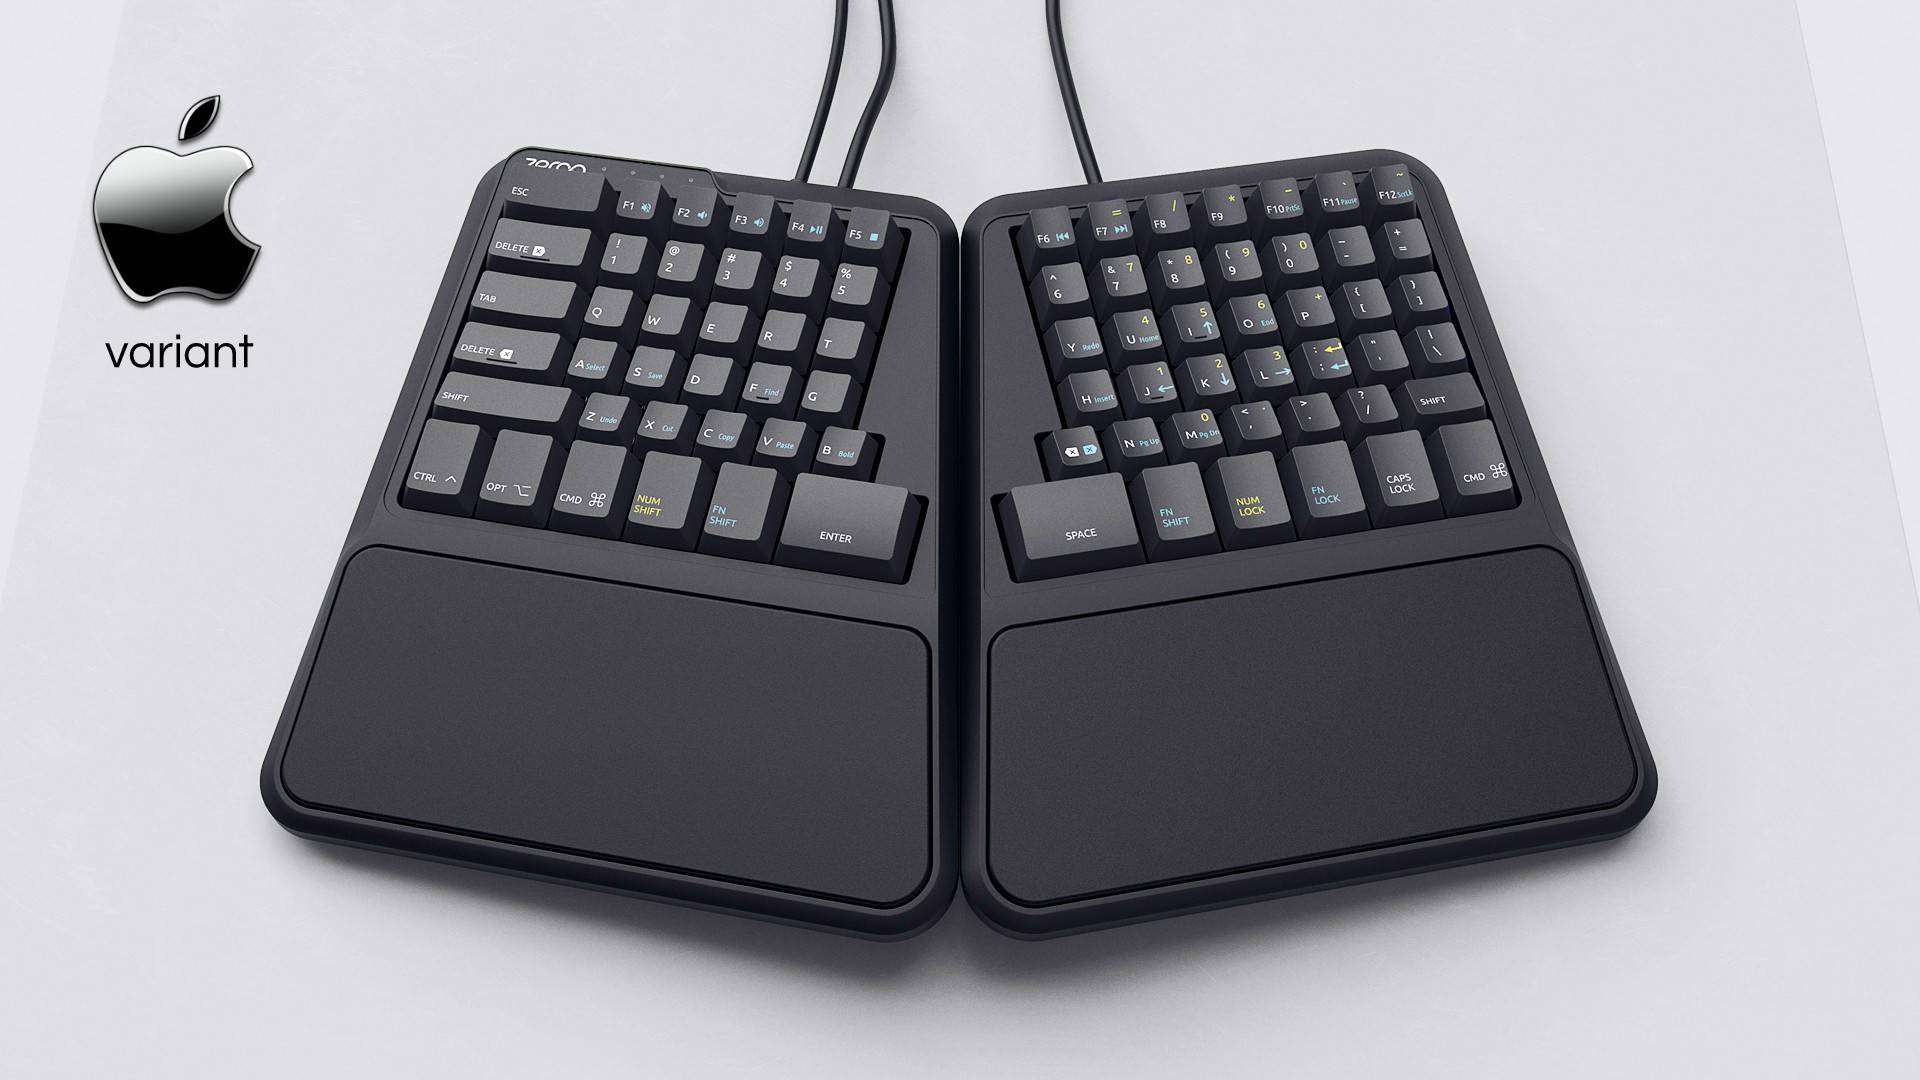 Zergotech Freedom top hero view mechanical keyboard ergonomic fixed palm rests